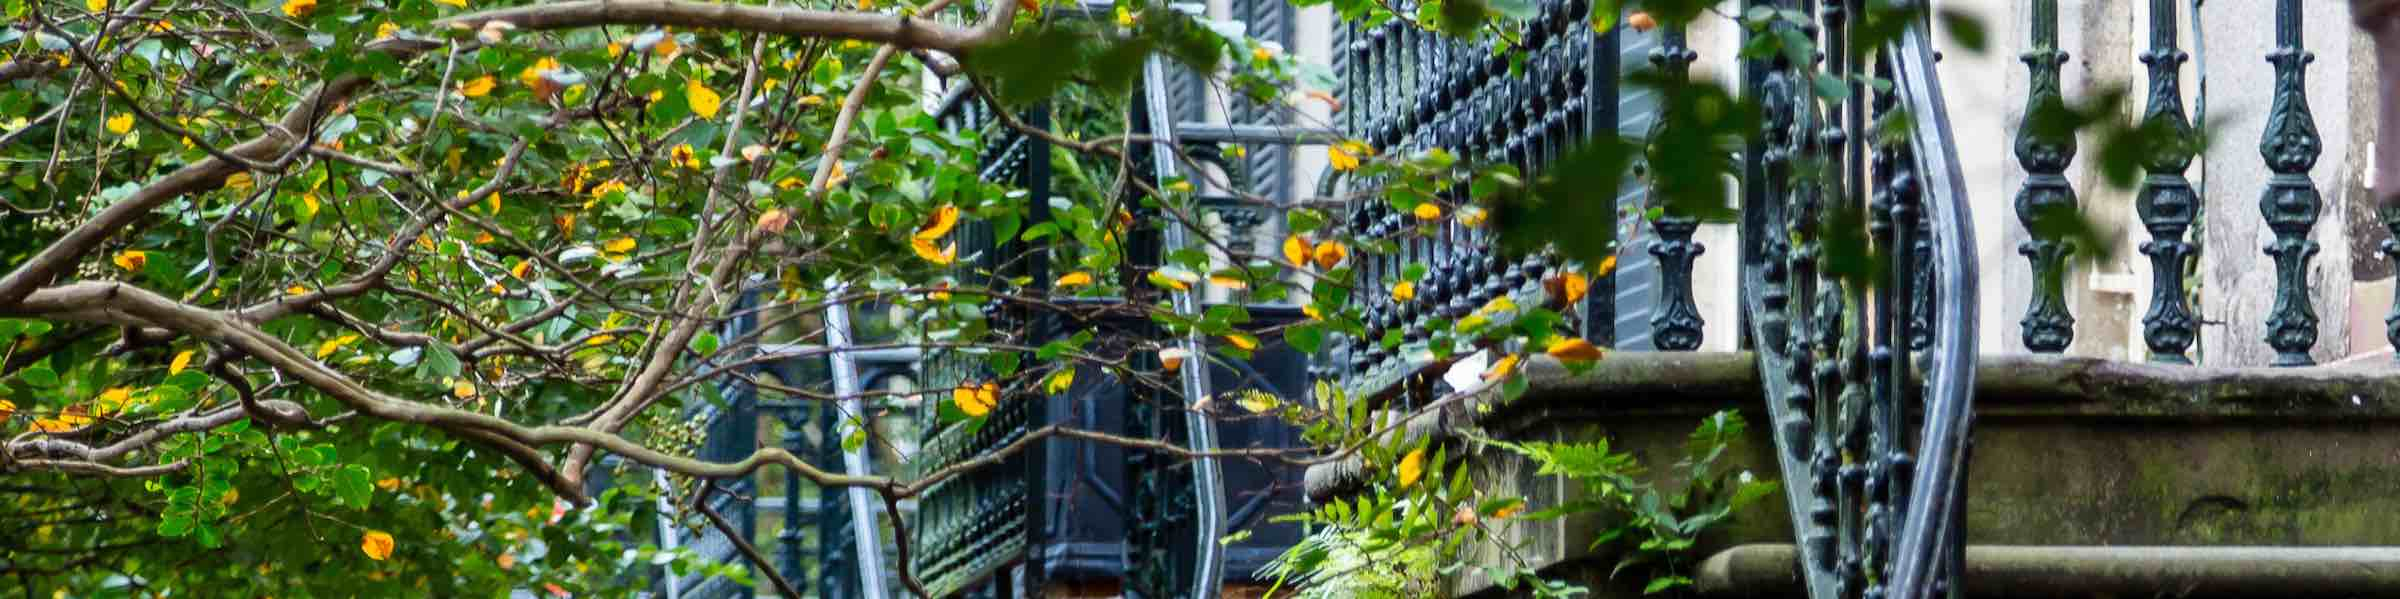 A few orange leaves in front of ironwork staircase railings on historic Gordon Row, near Chatham Square, Savannah, GA.